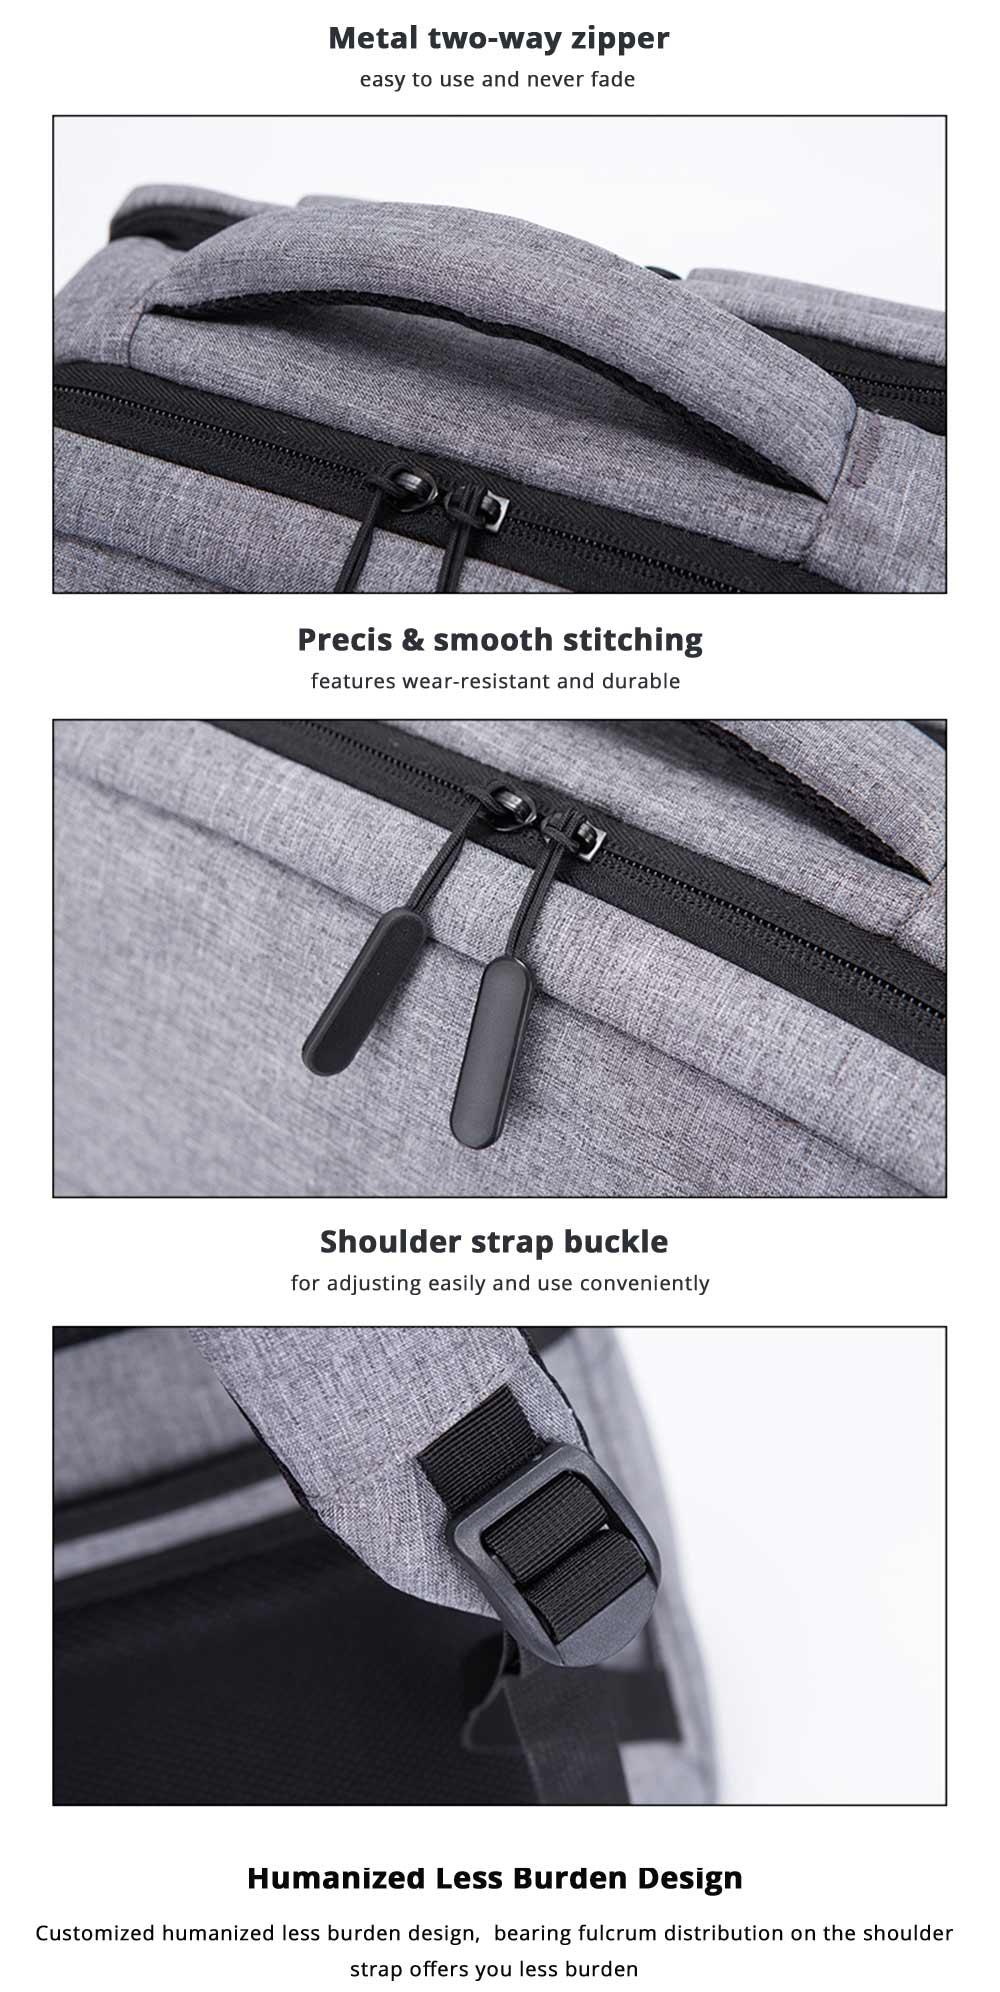 Metal two-way zipper